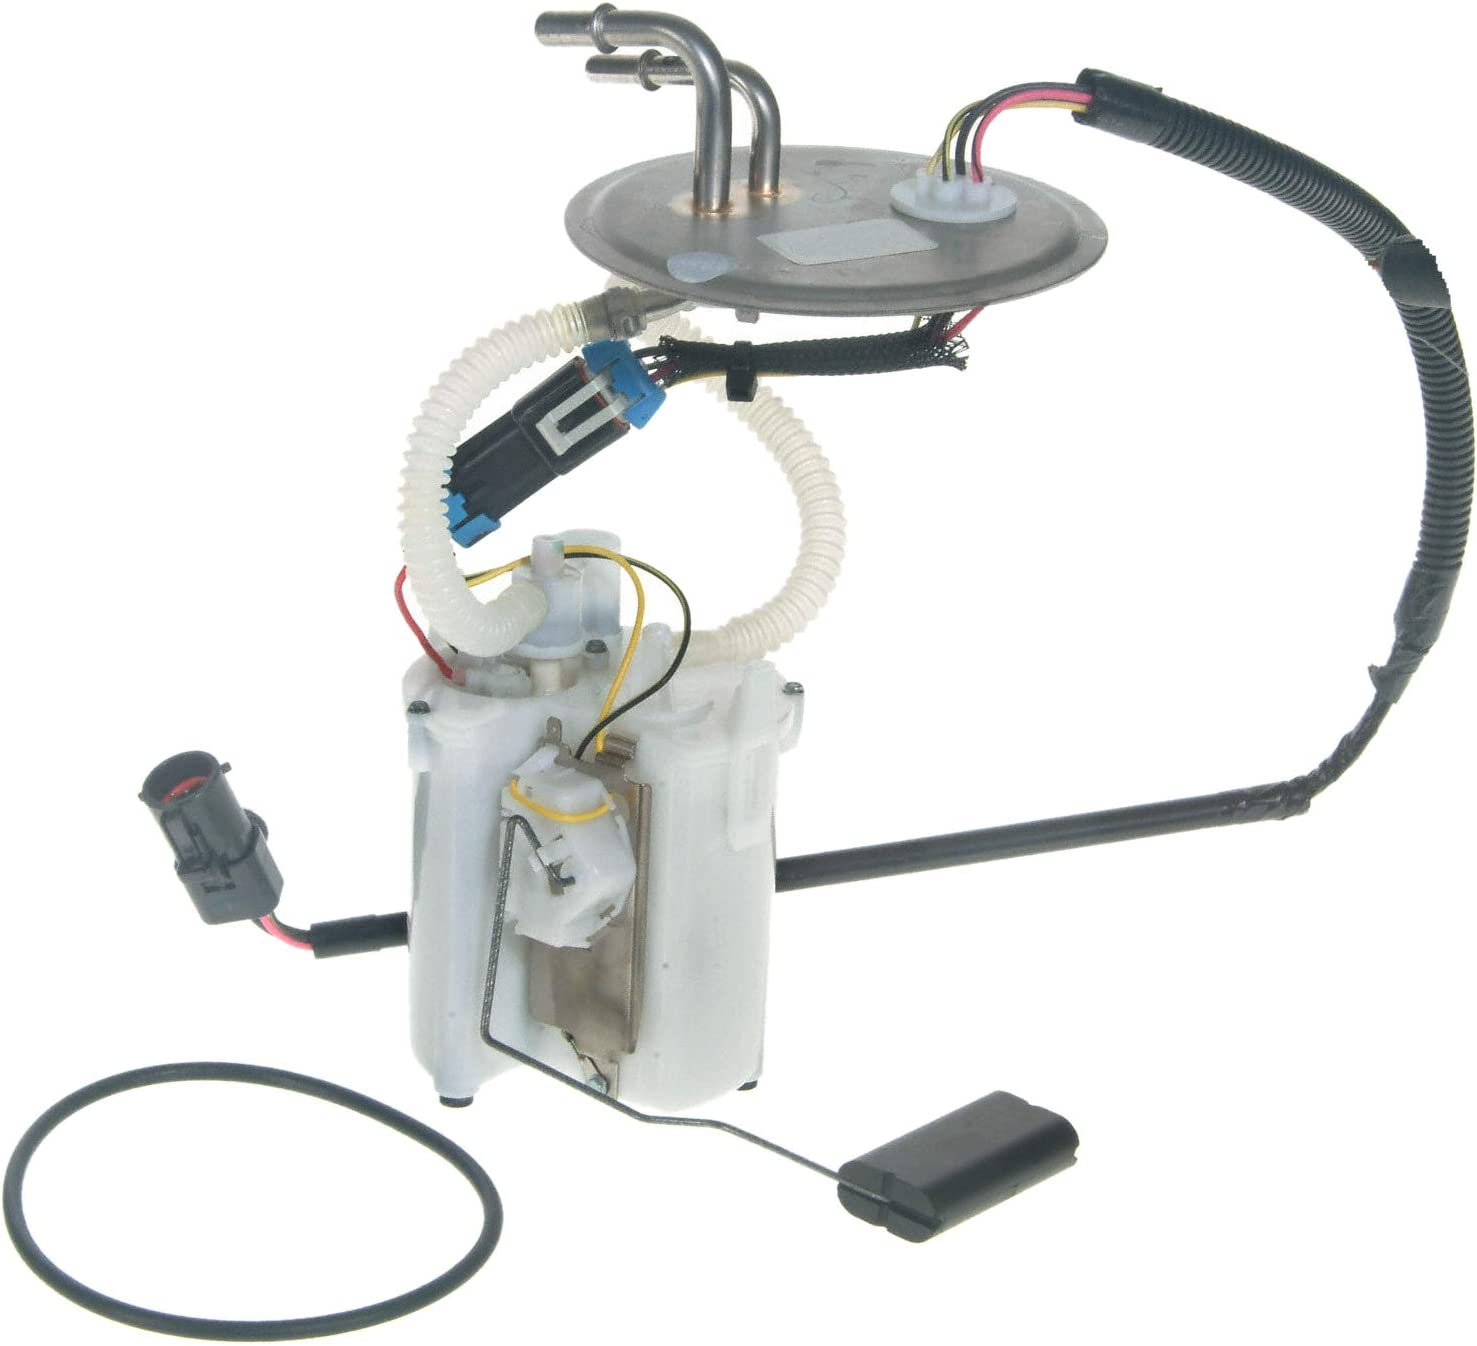 Cheap mail order sales Carter P76053M Fuel Module Store Assembly Pump